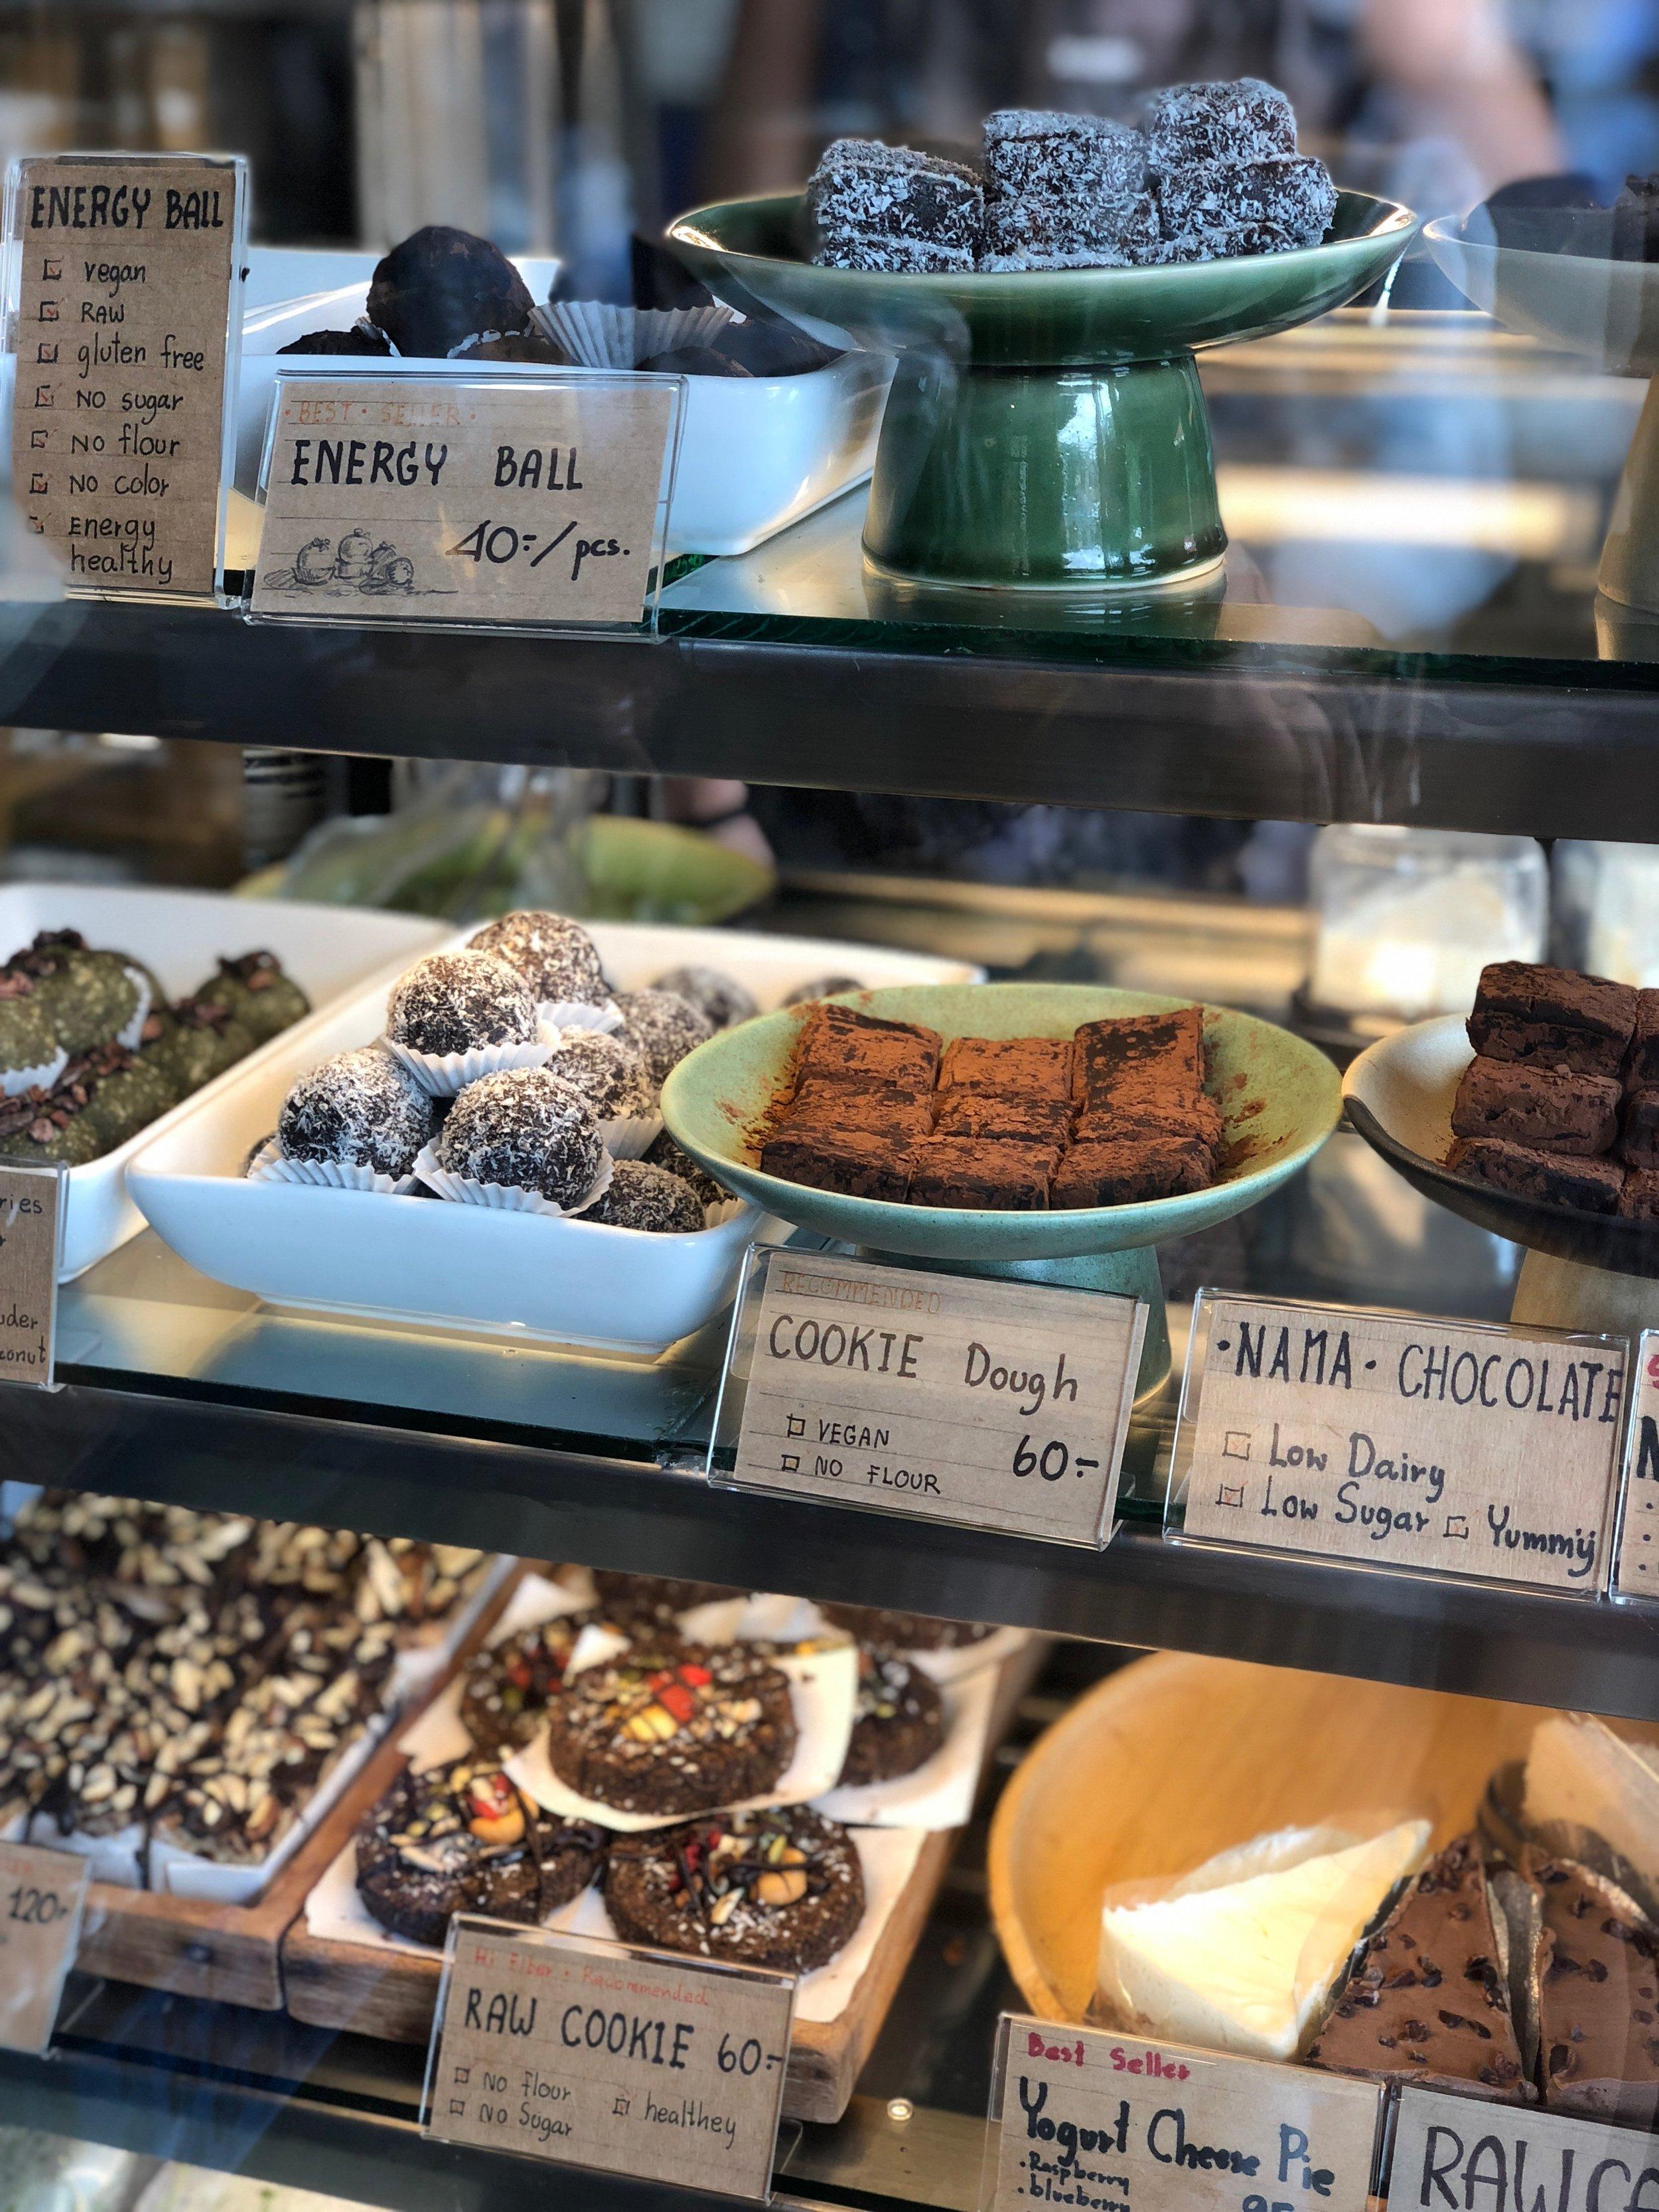 samui_health_shop_dessert_display.jpg